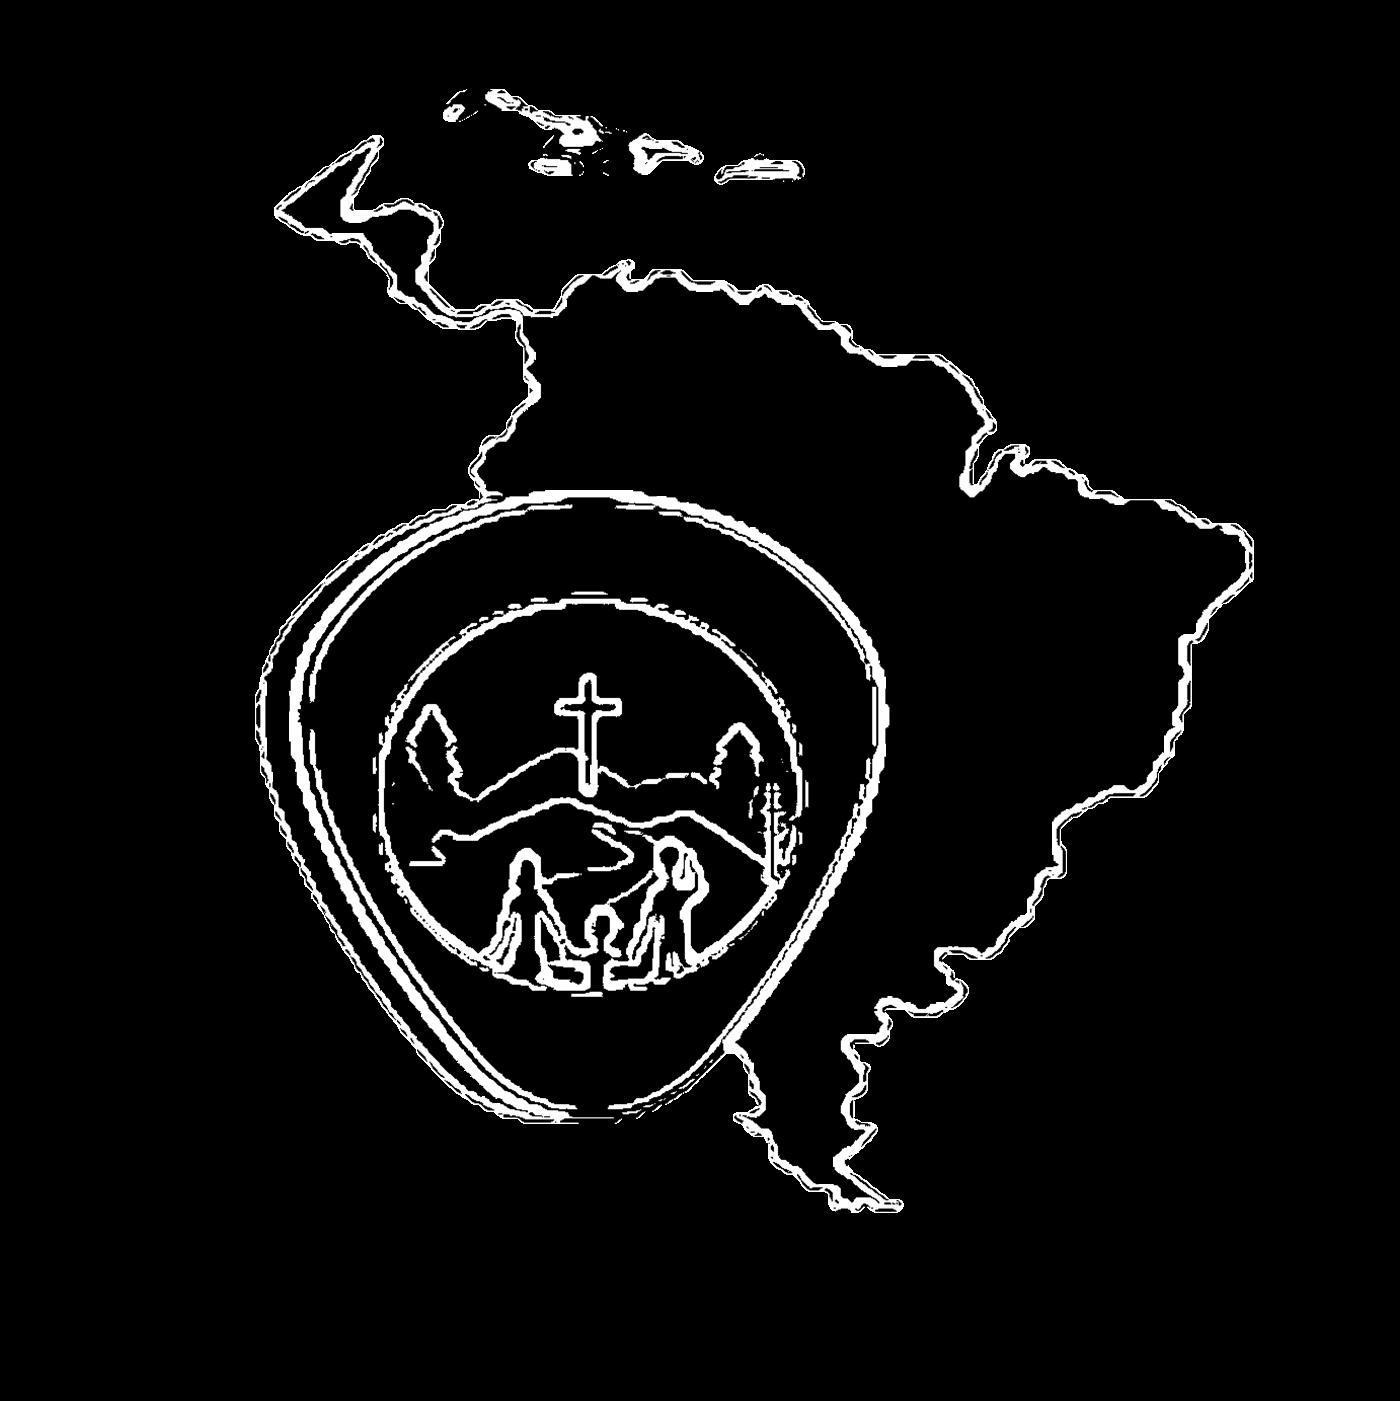 Modelo De Camisa Uniforme Para Aventureiros By Deivid Borges